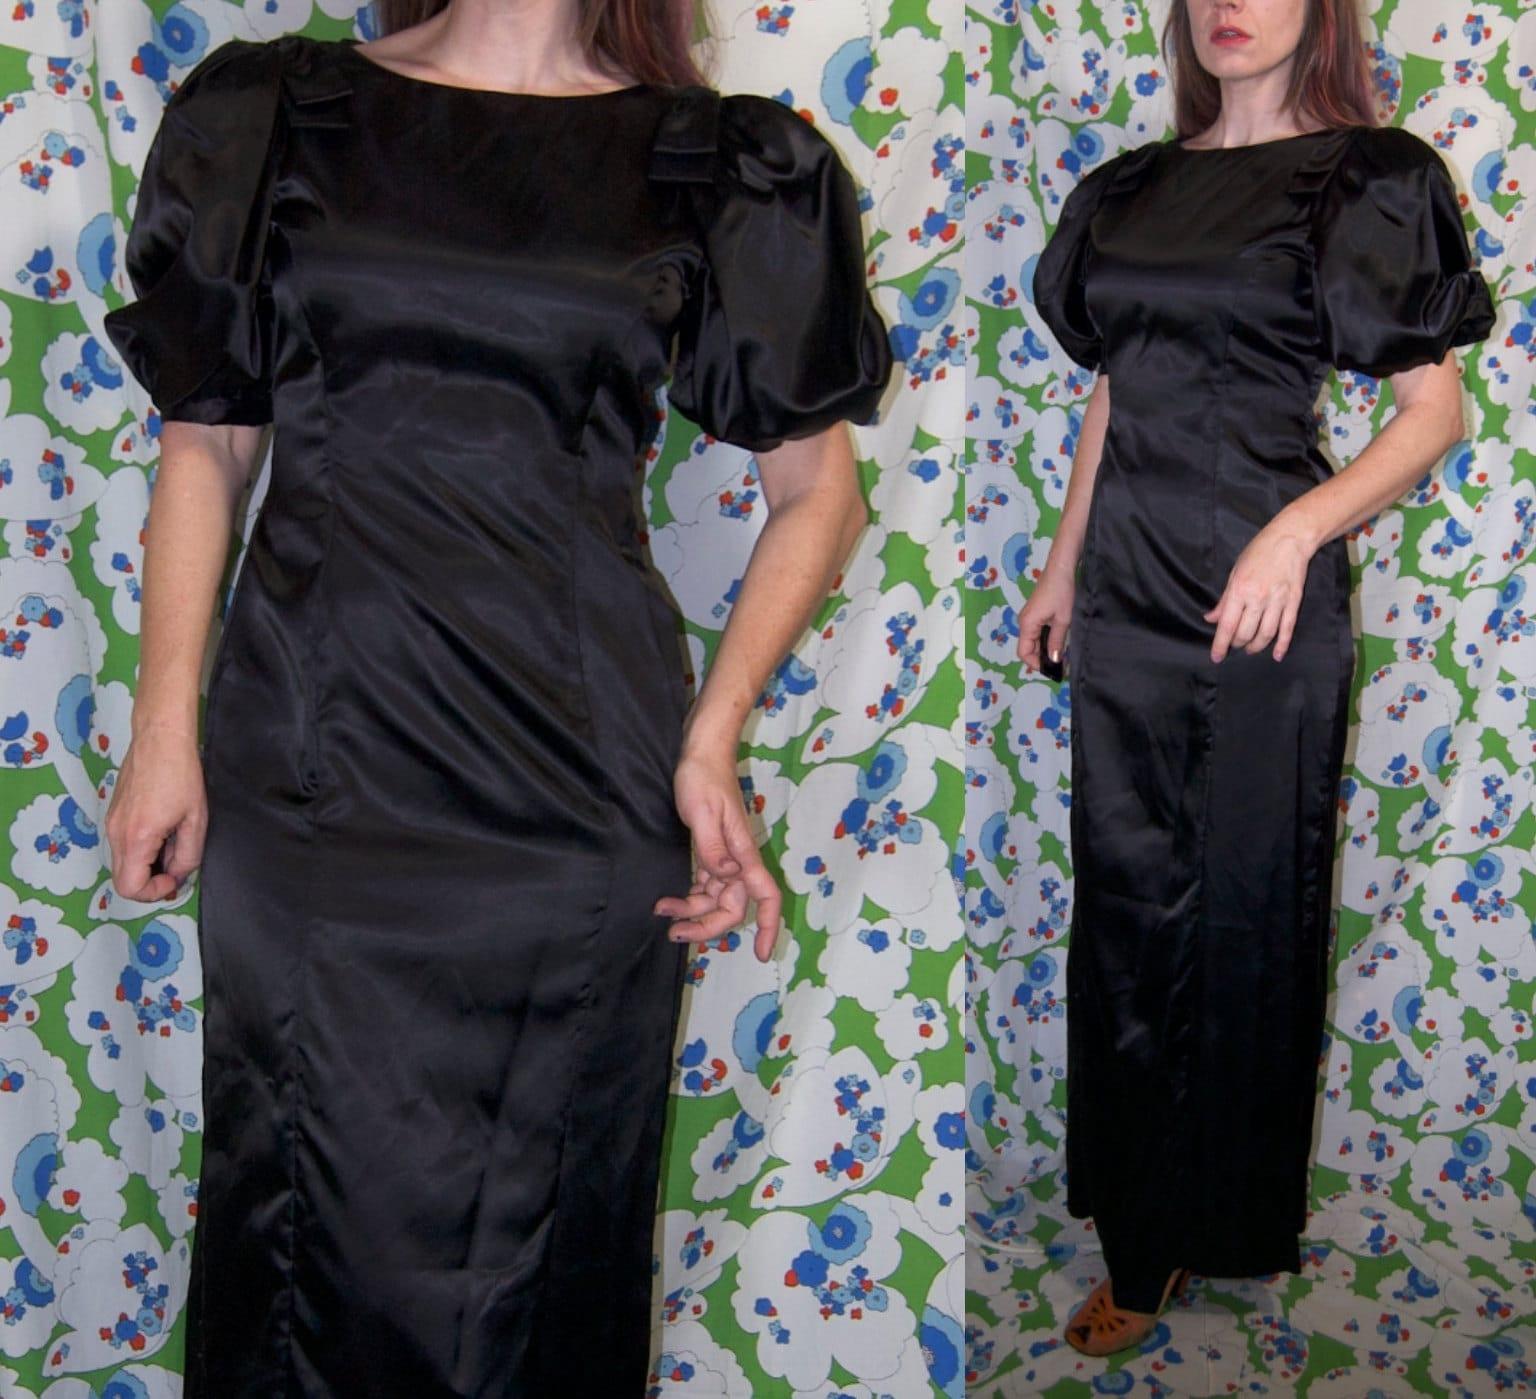 80s Dresses   Casual to Party Dresses Vintage 1980s Big Sleeve Inky Black Shiny Satin Wiggle Dress $24.00 AT vintagedancer.com